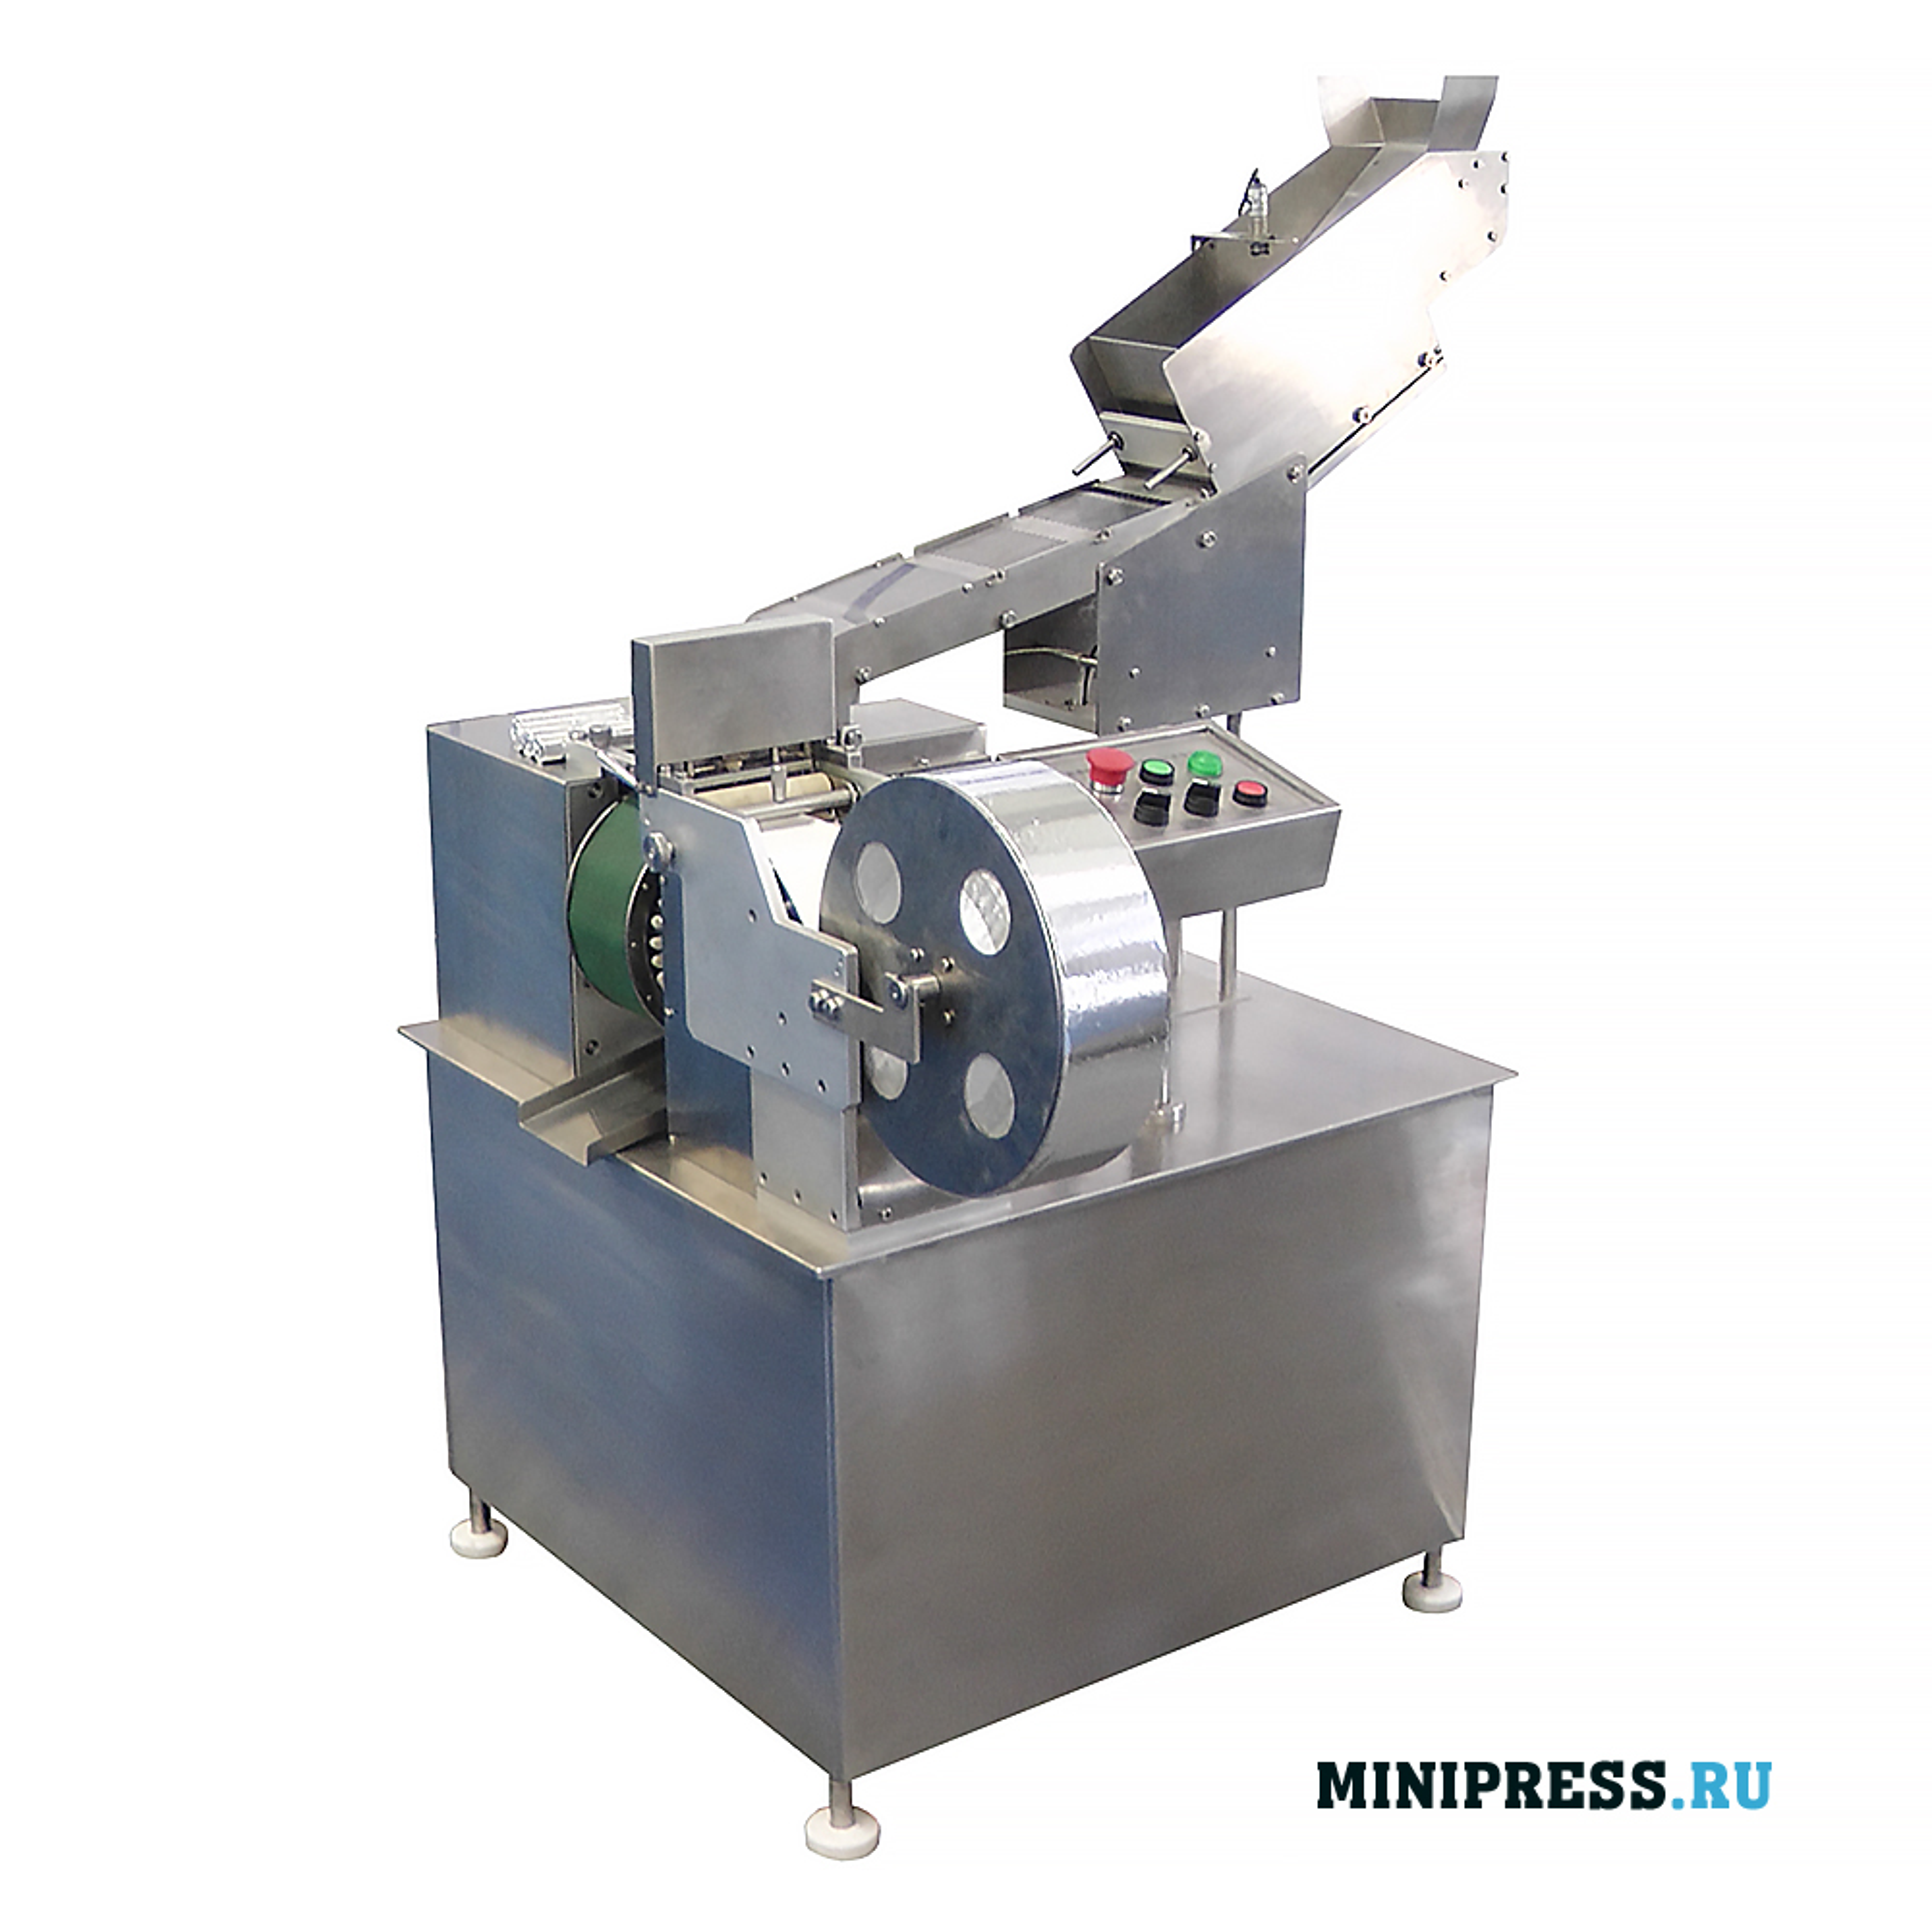 Машина для групповой упаковки таблеток диаметром 20-25 мм